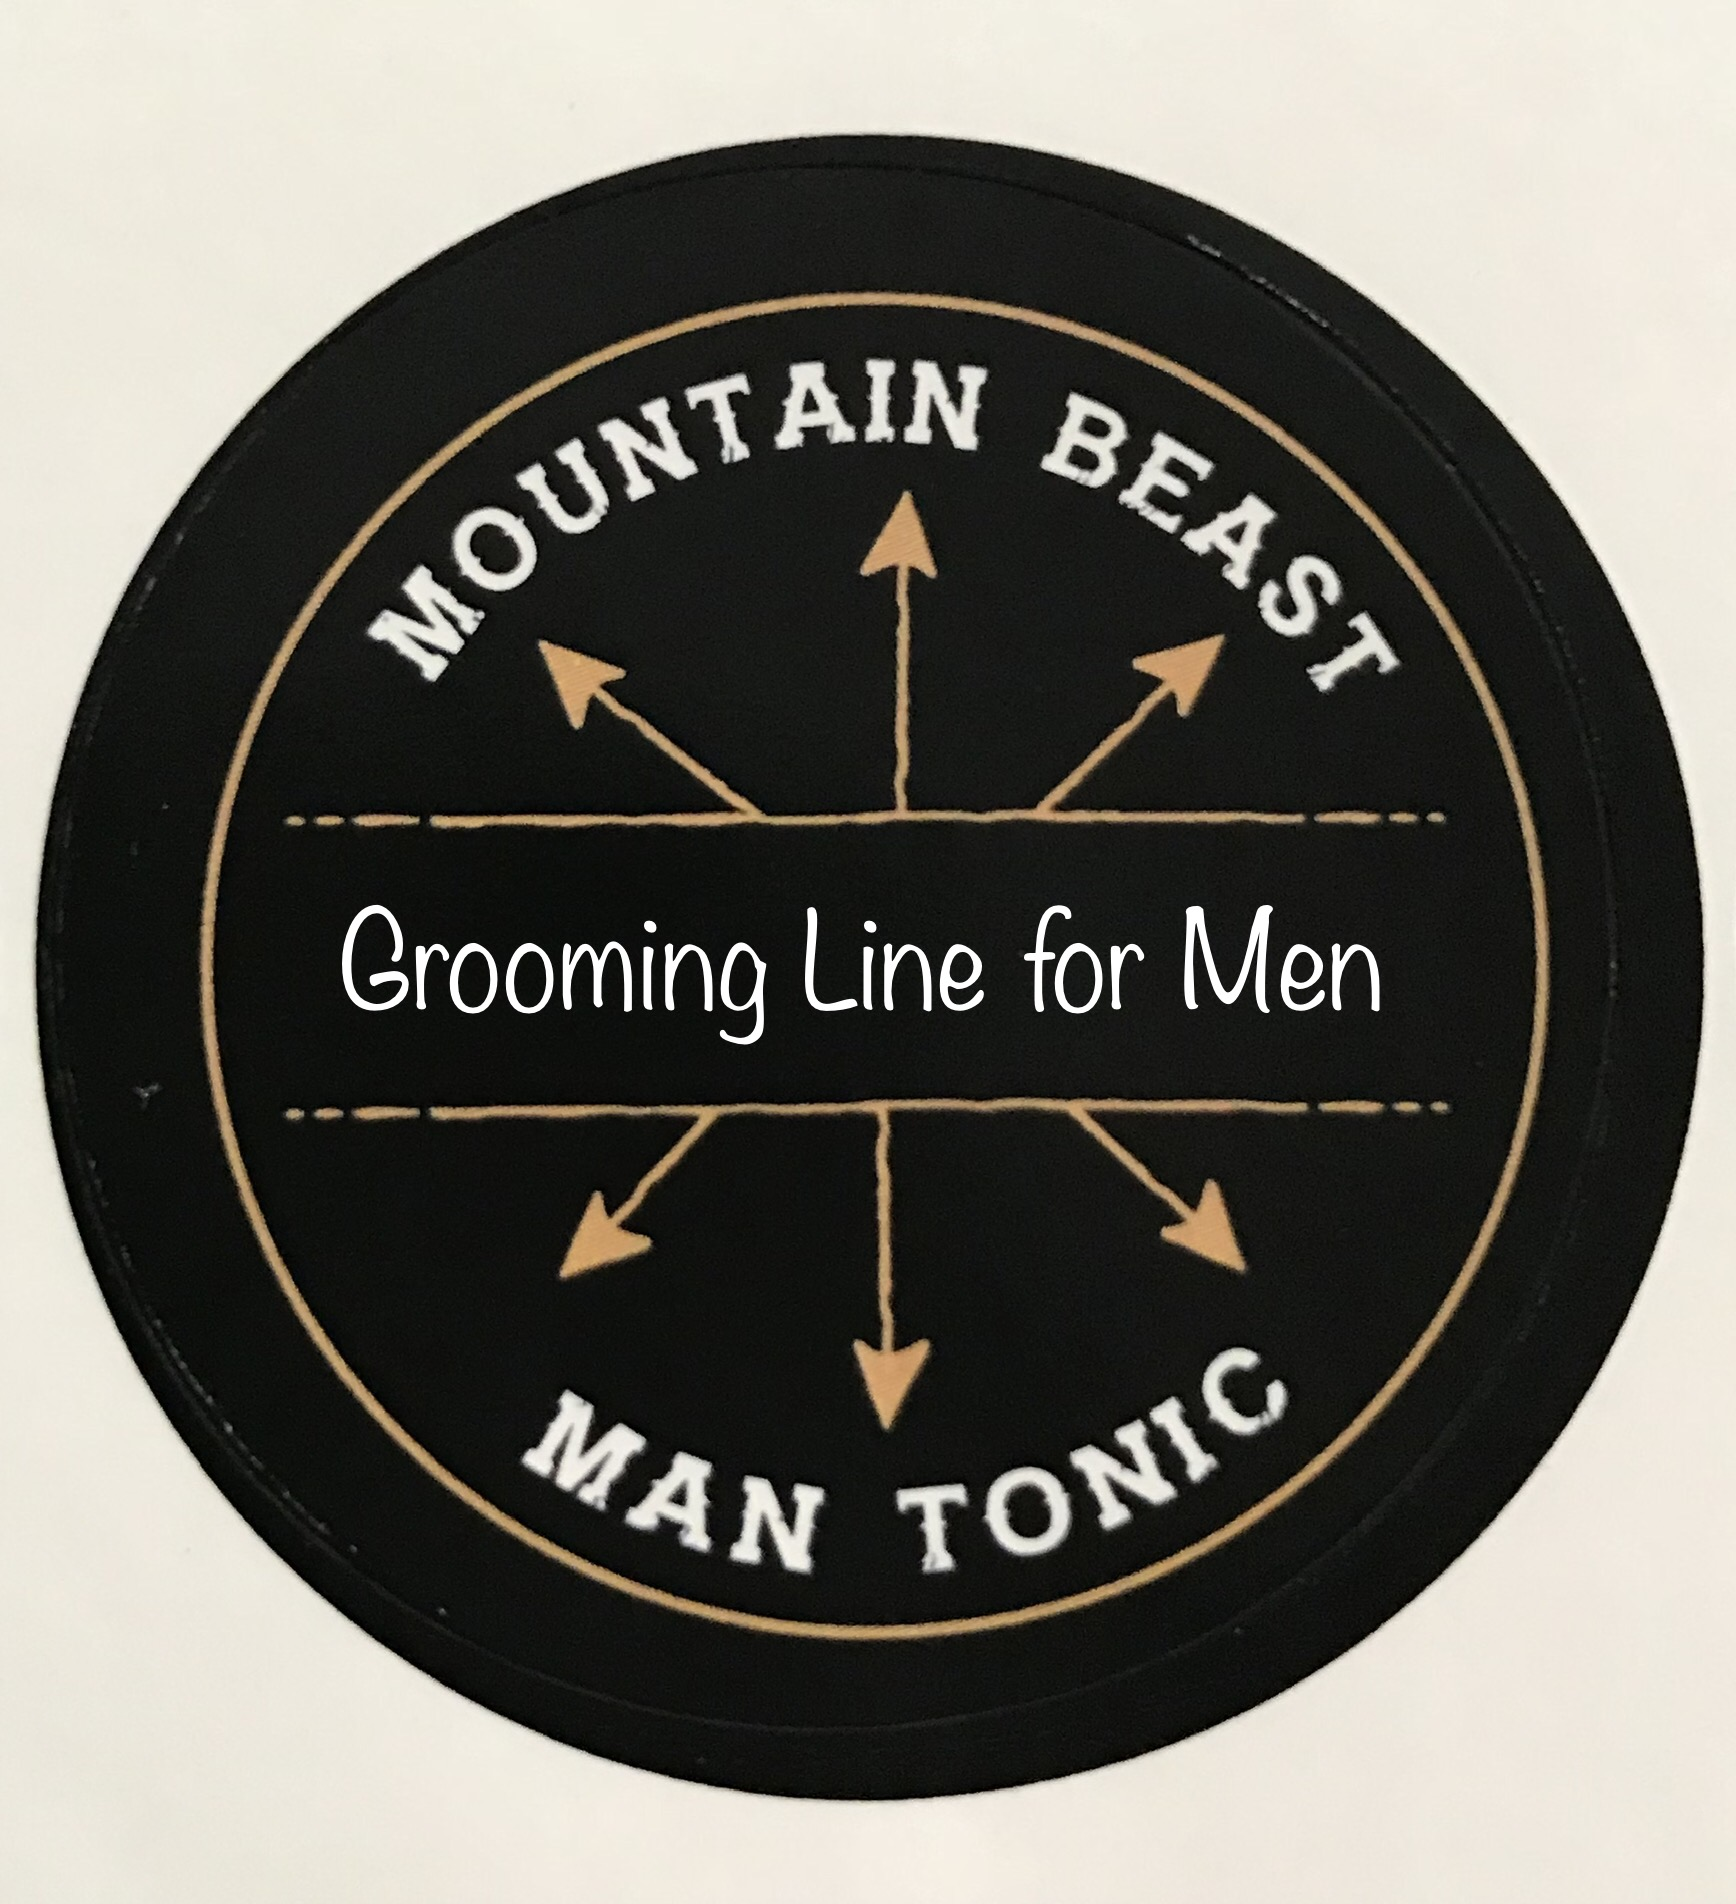 Mountain Beast Man Tonic